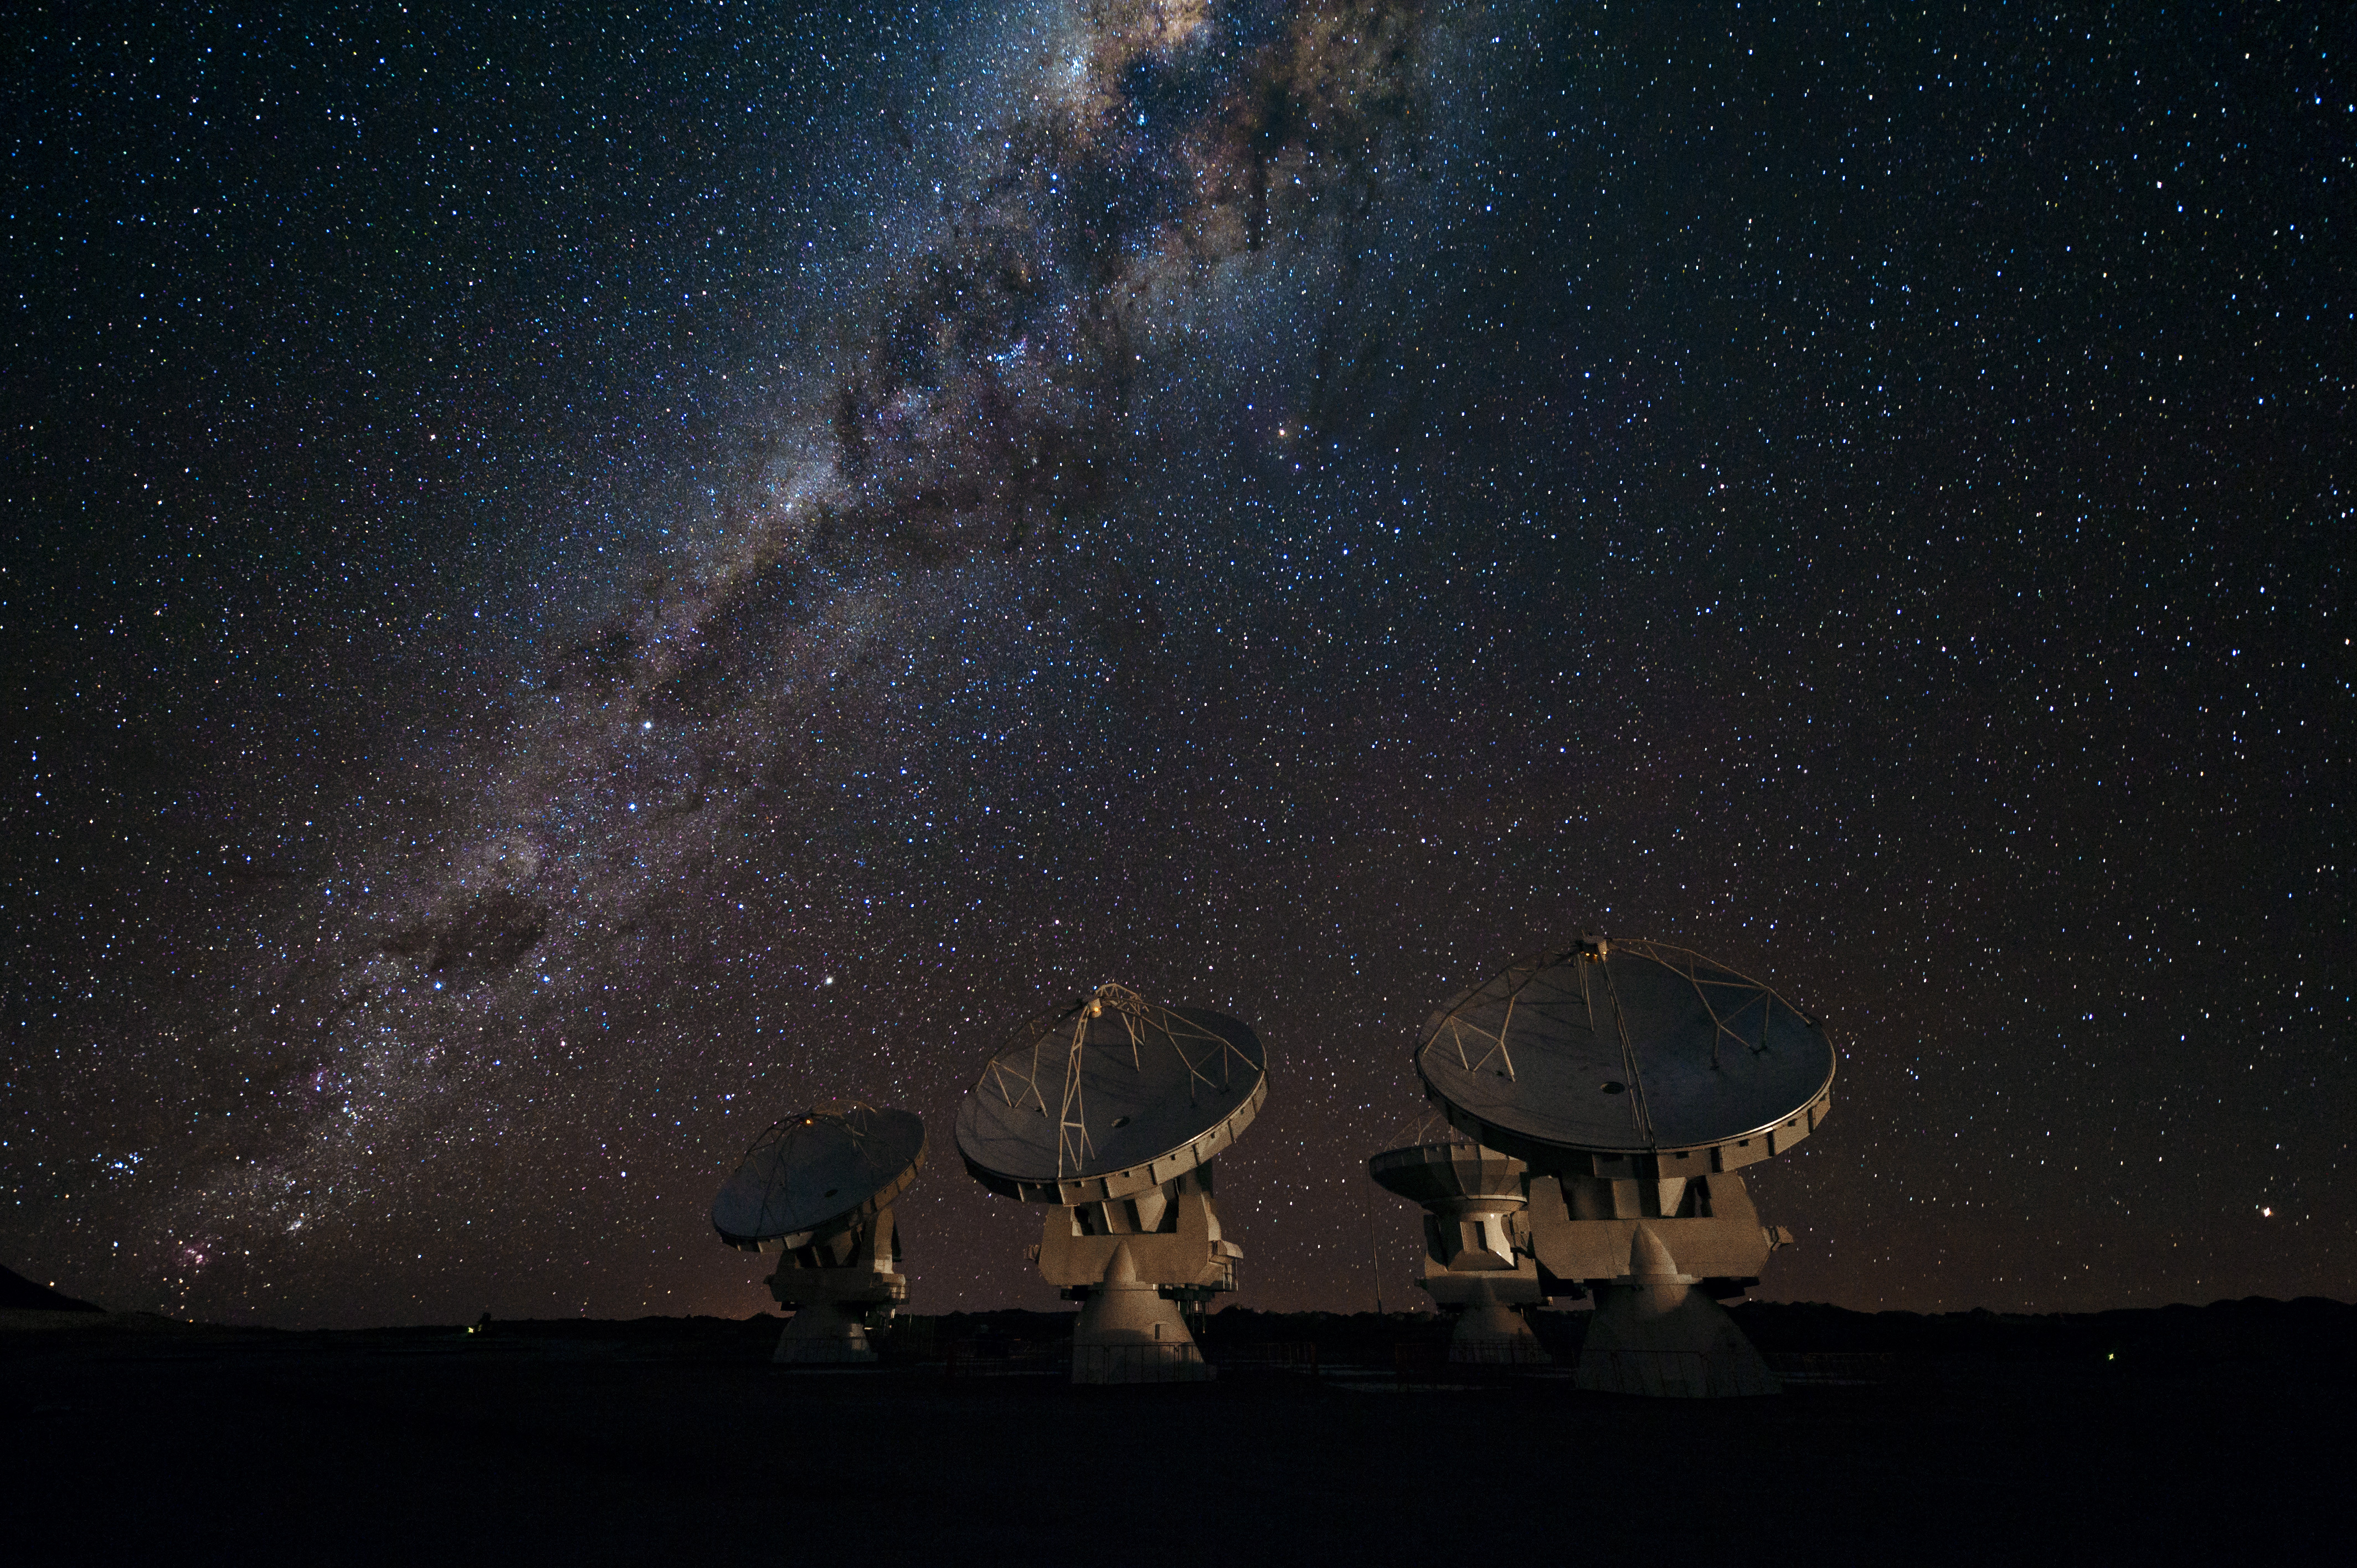 milky way galaxy - HD2560×1600